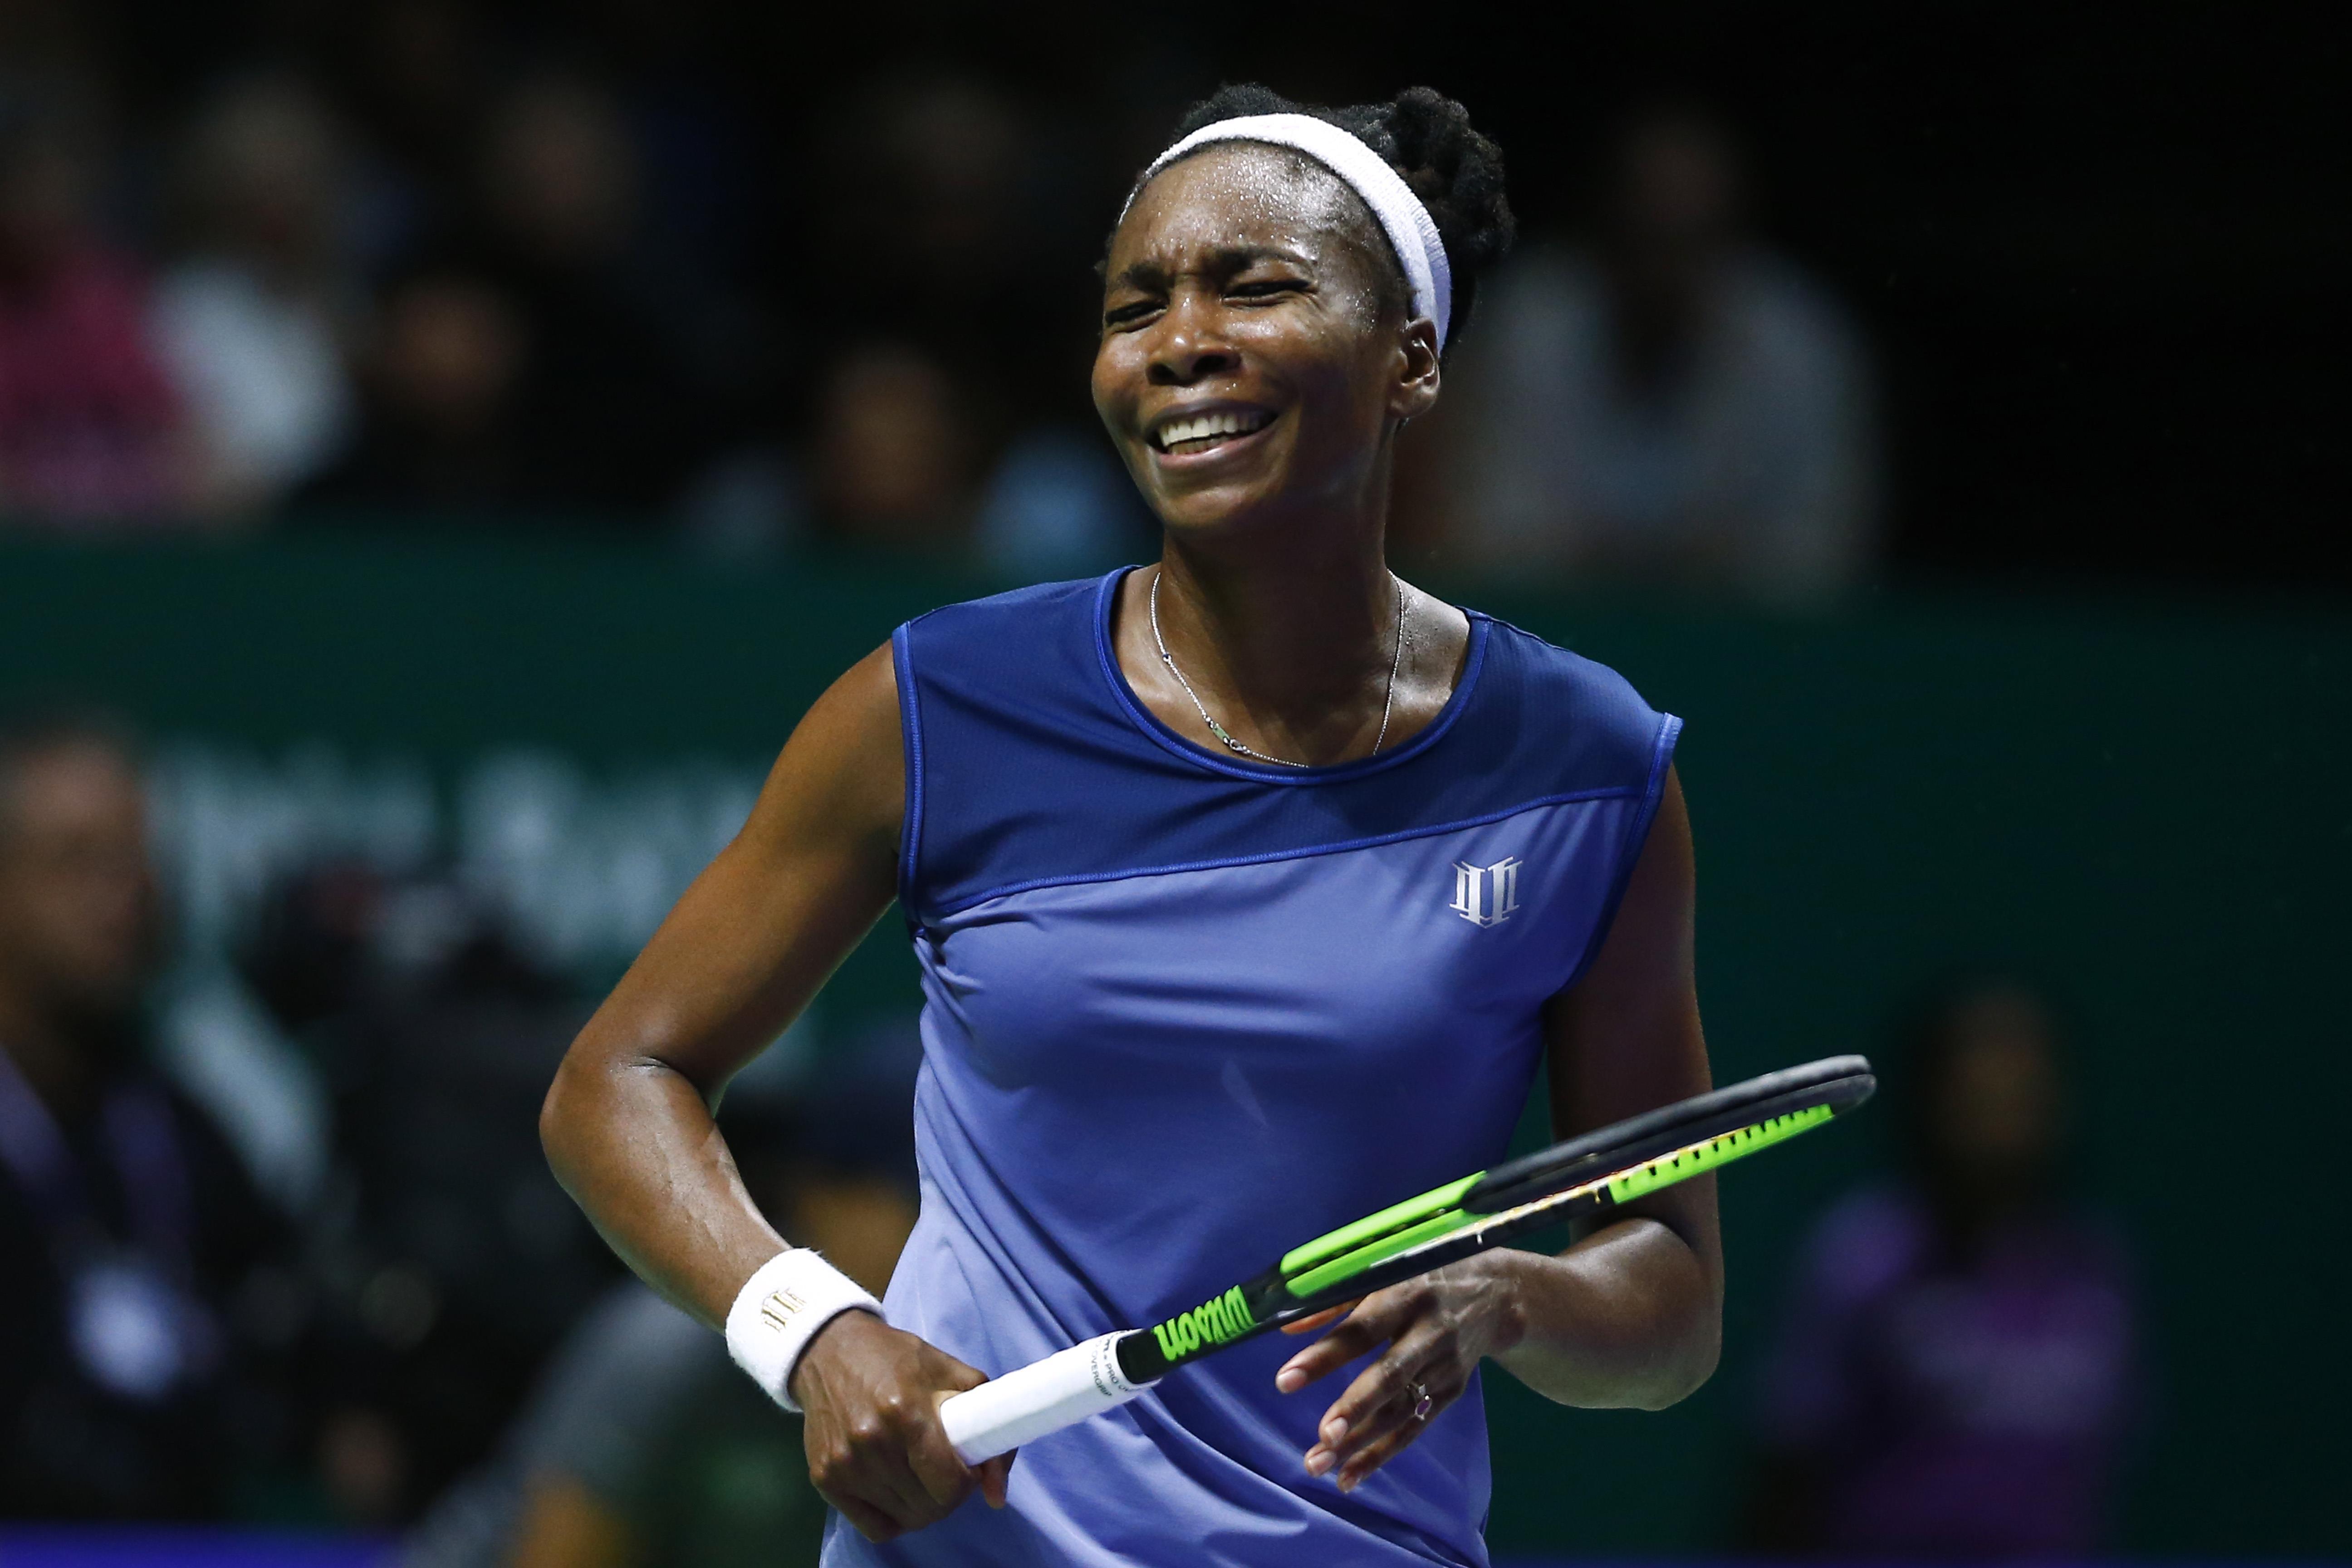 Sự thất vọng của Venus trong trận thua Wozniacki. Ảnh: REUTERS